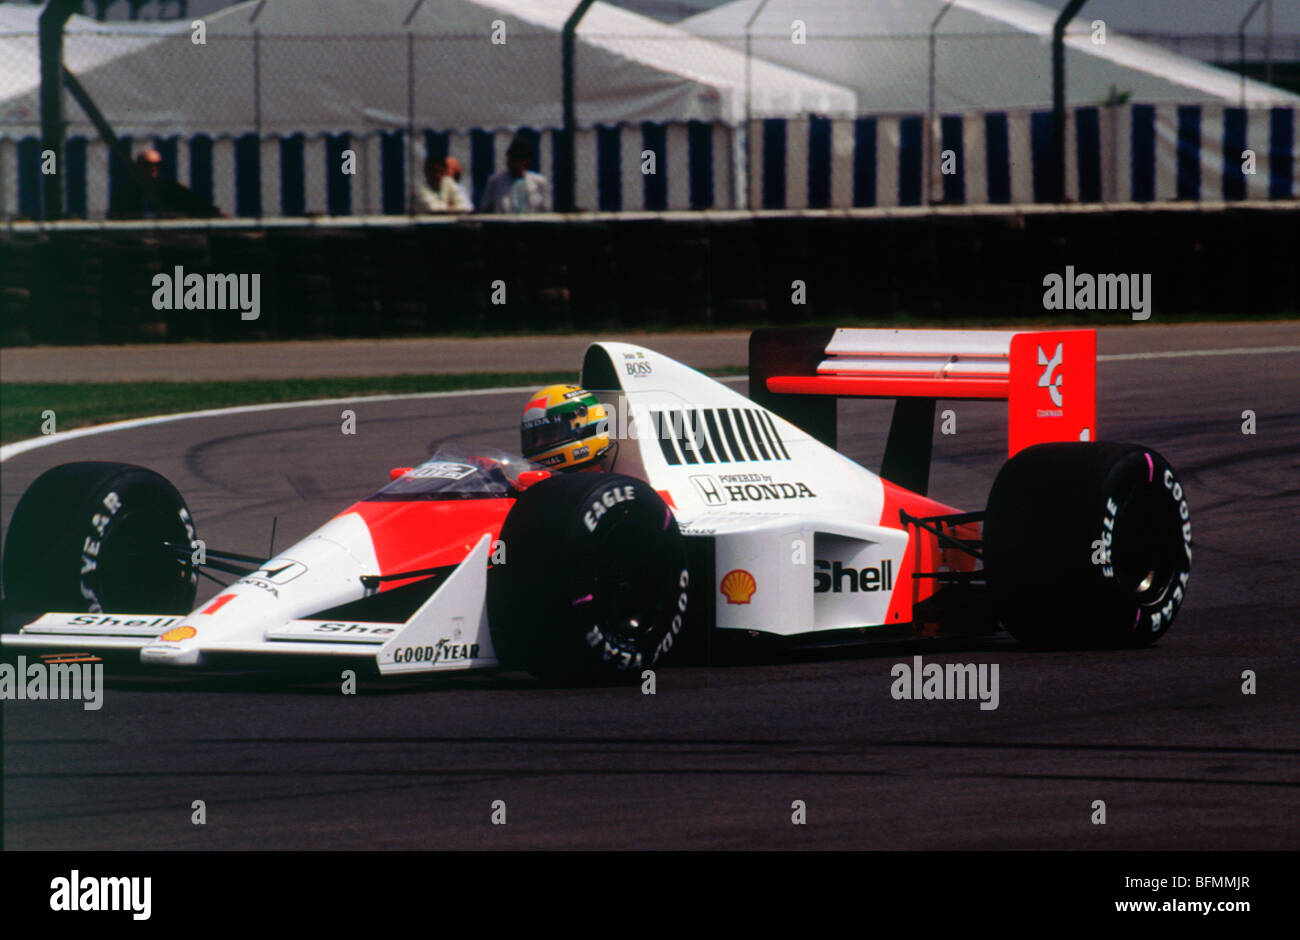 Ayrton Senna in the McLaren MP4-5 1989 British Grand Prix at Silverstone Stock Photo